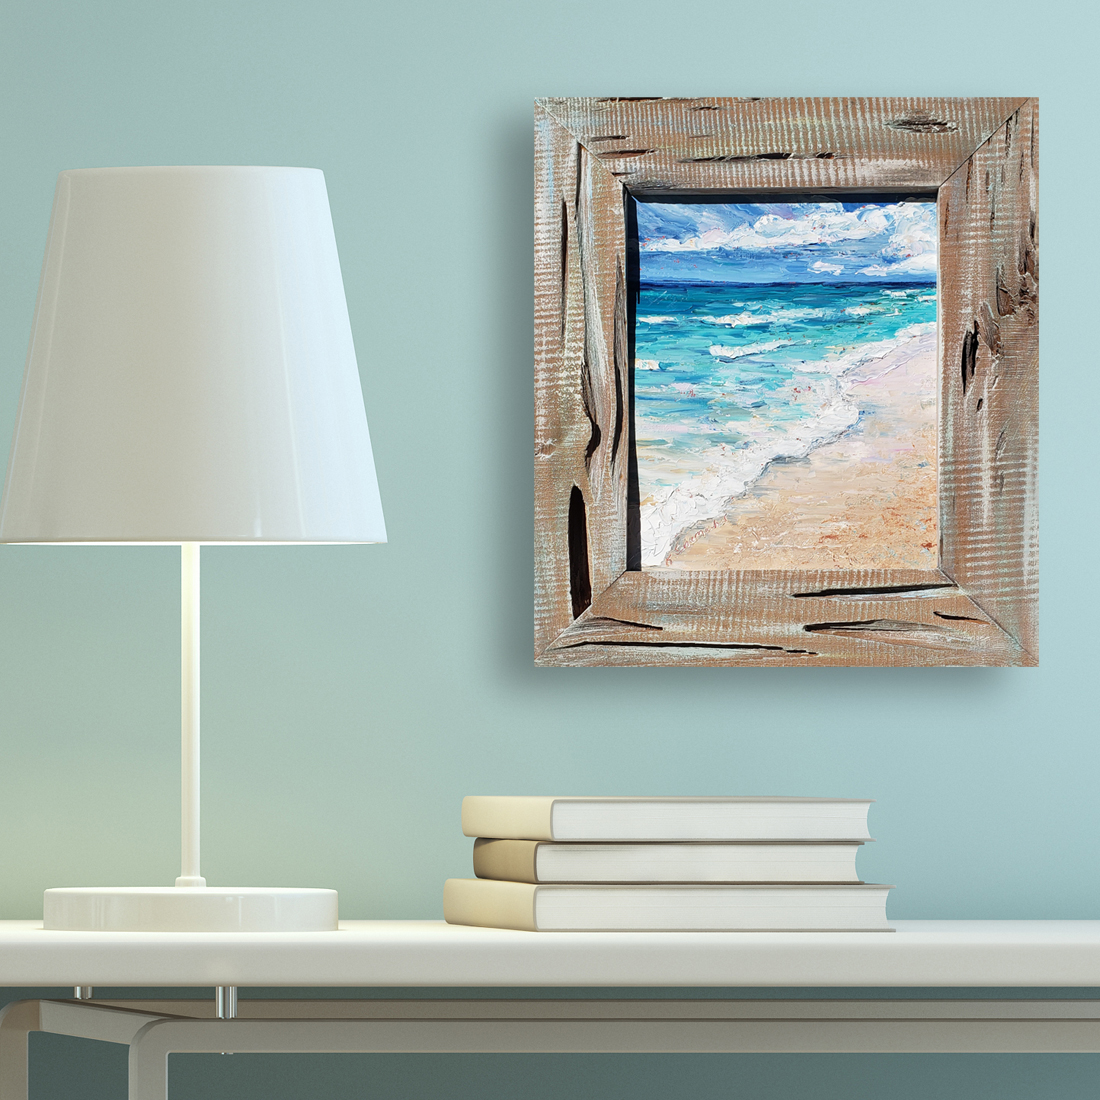 Emerald Waves 21×18 framed low hung